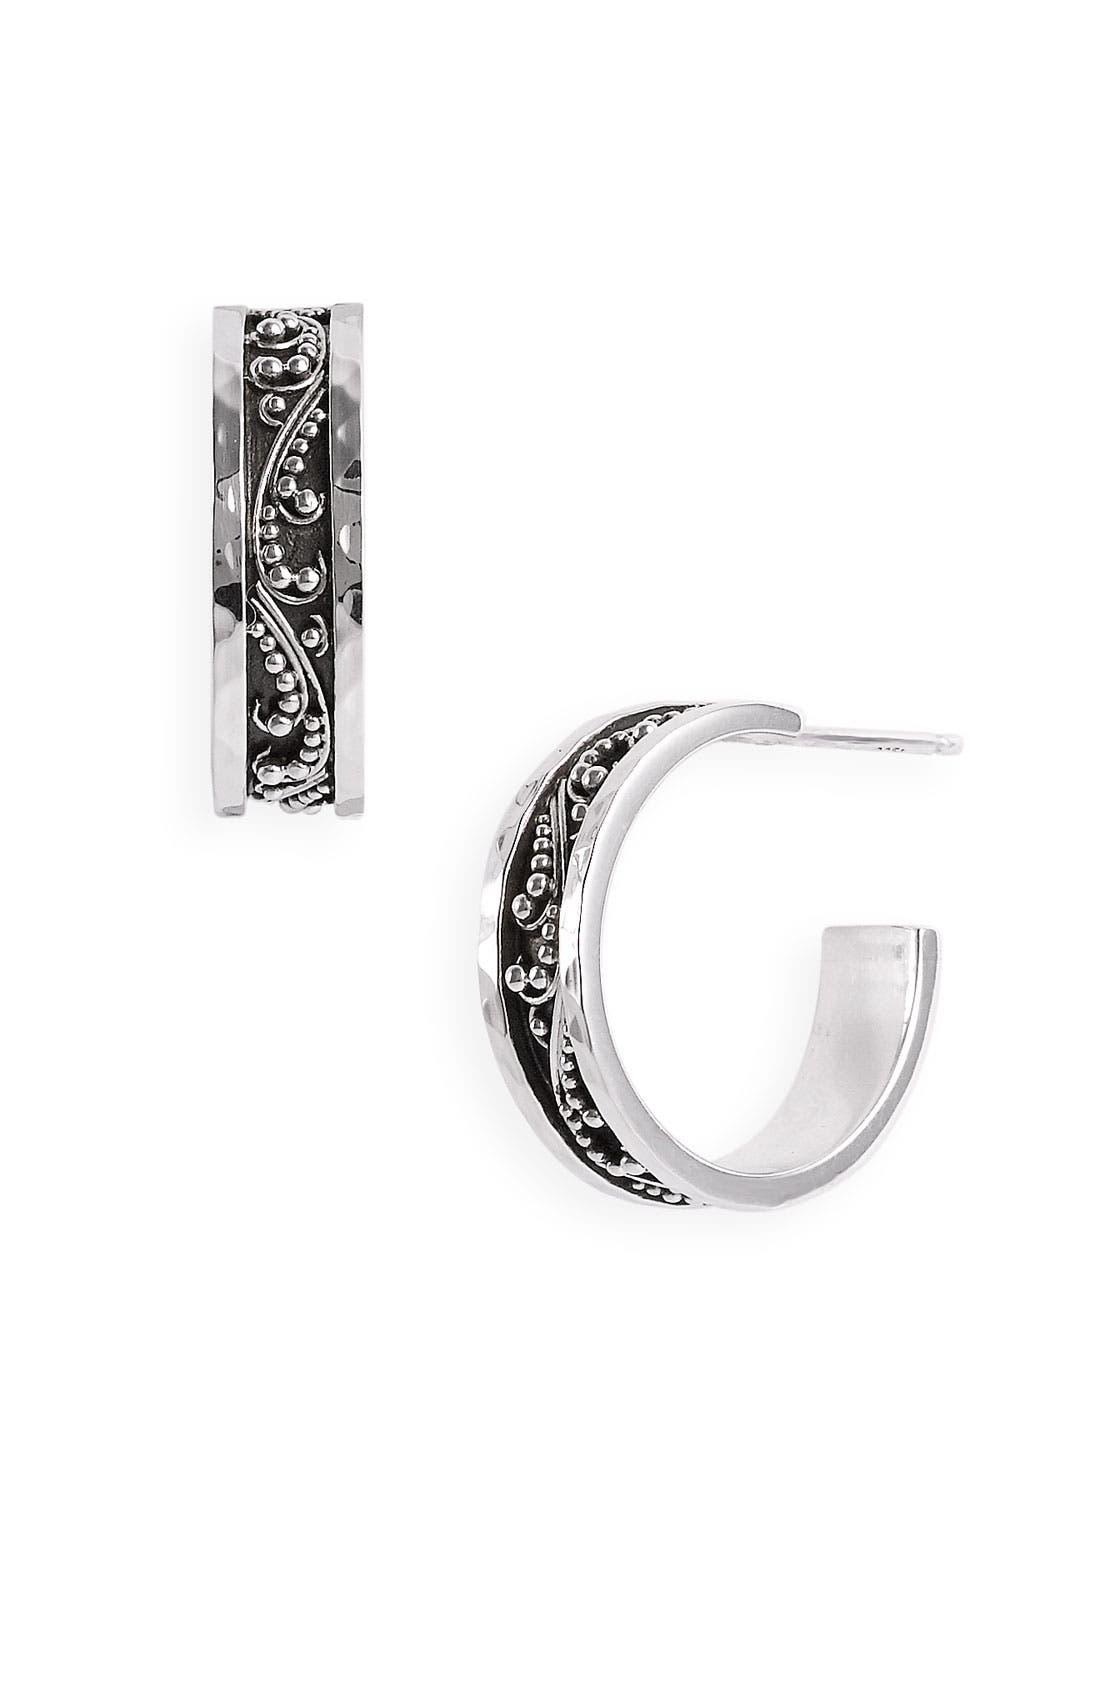 Main Image - Lois Hill 'Classics' Small Granulated Hoop Earrings